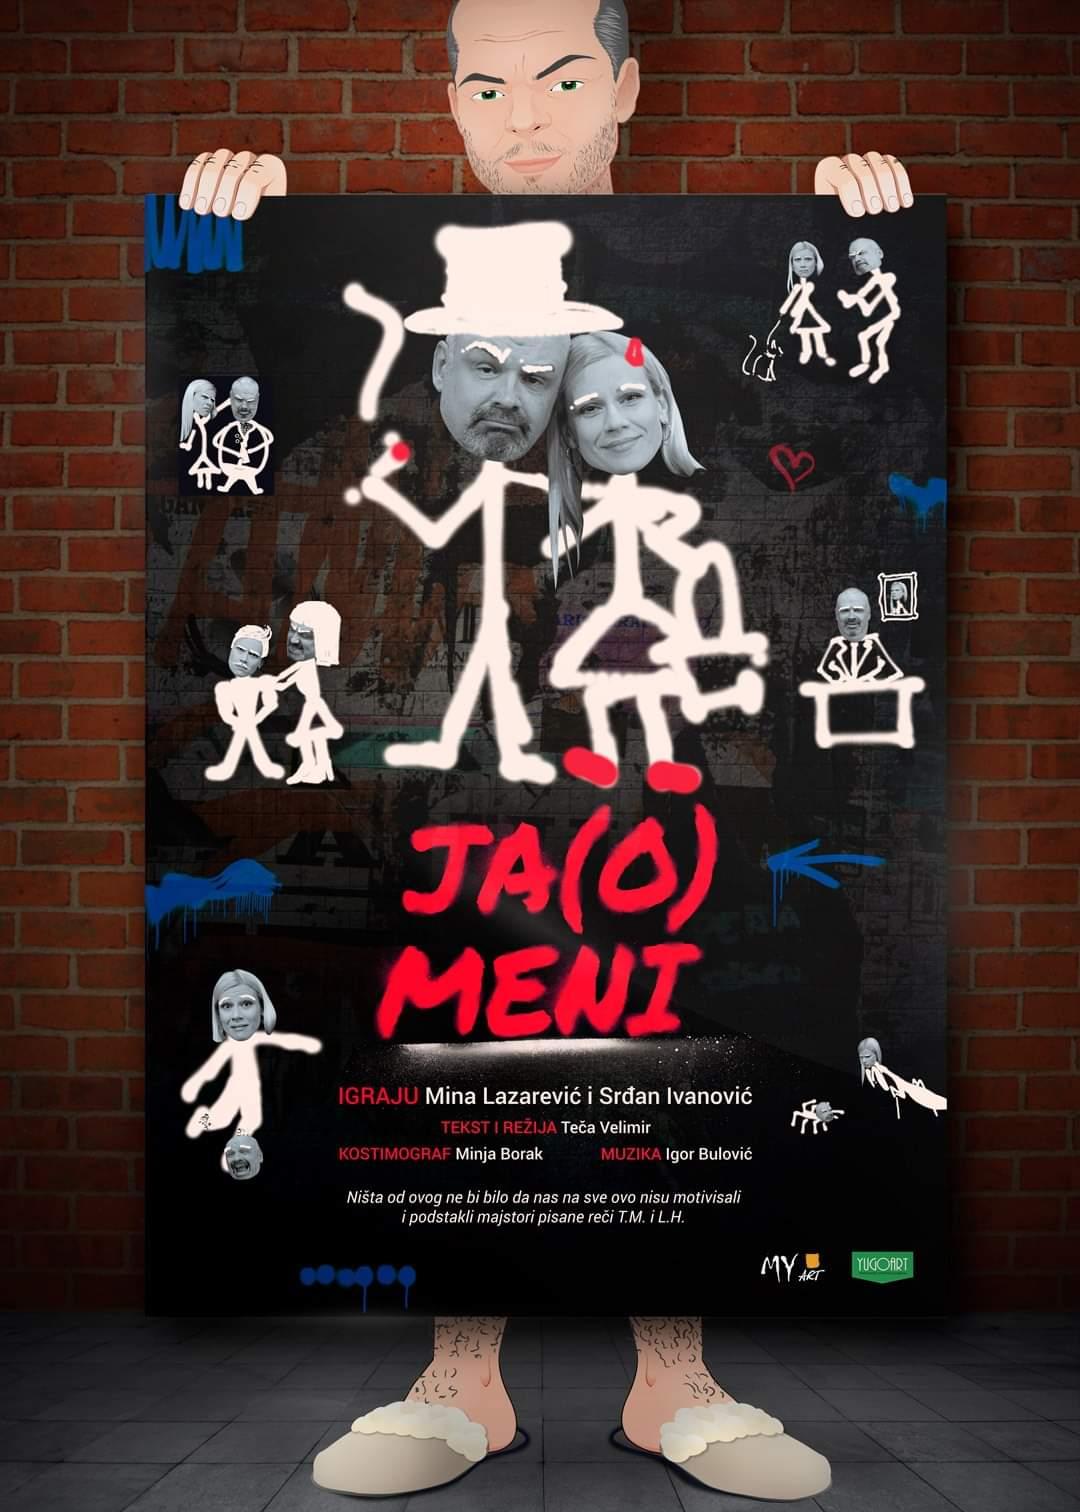 plakat predstava 12. 2. 2021.